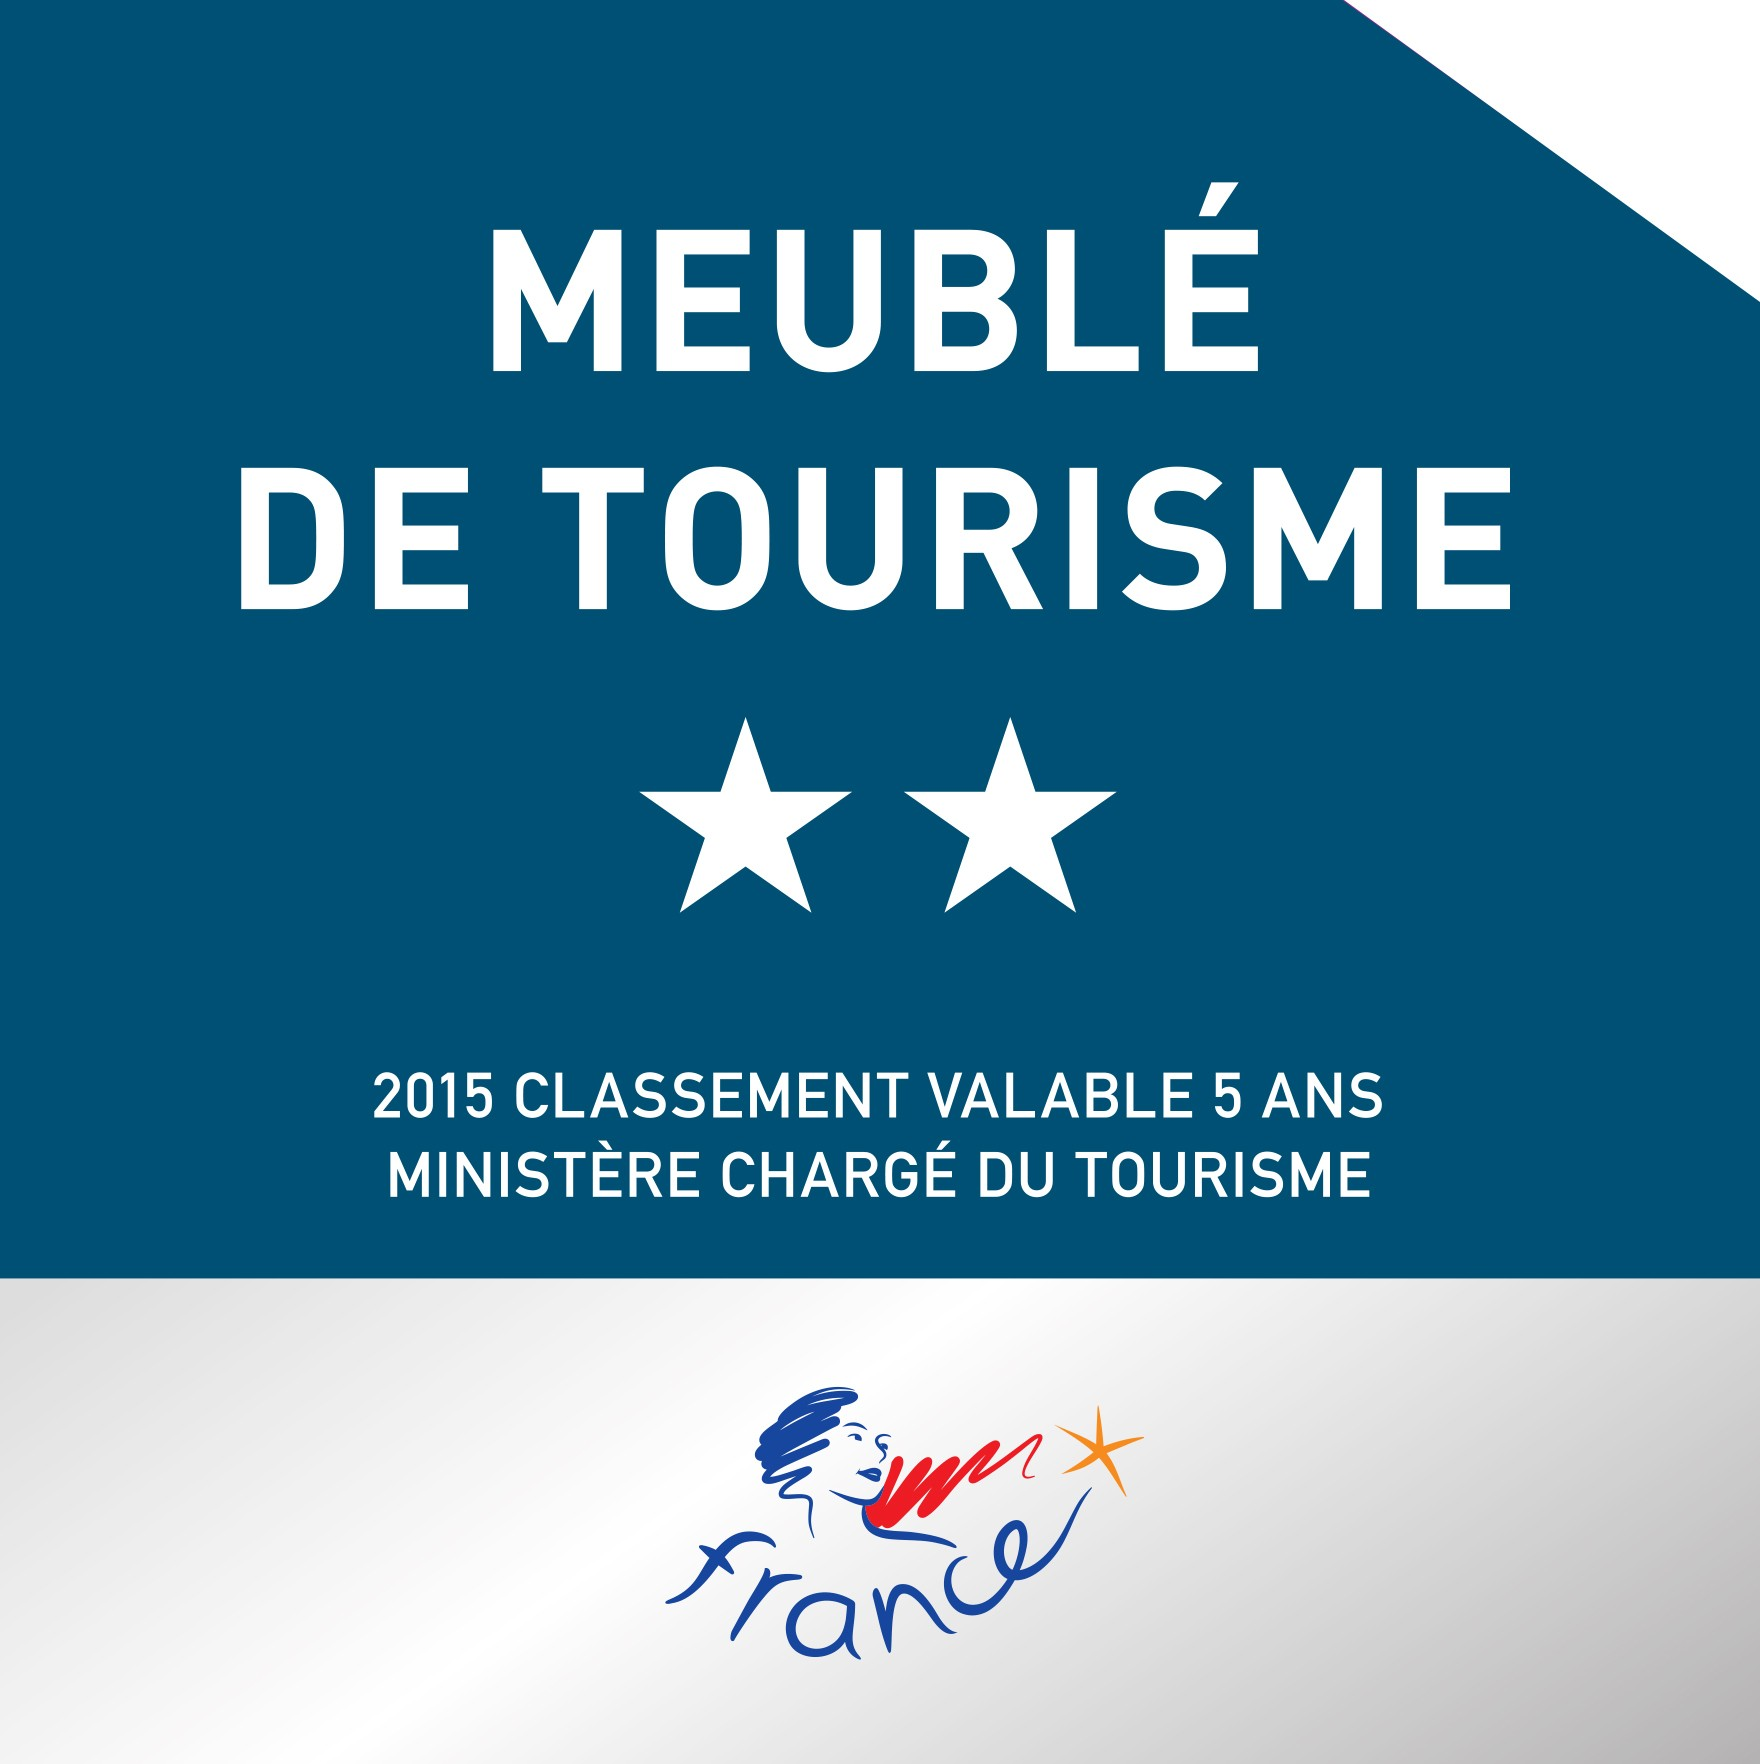 plaque-meuble-tourisme2-2015-11613